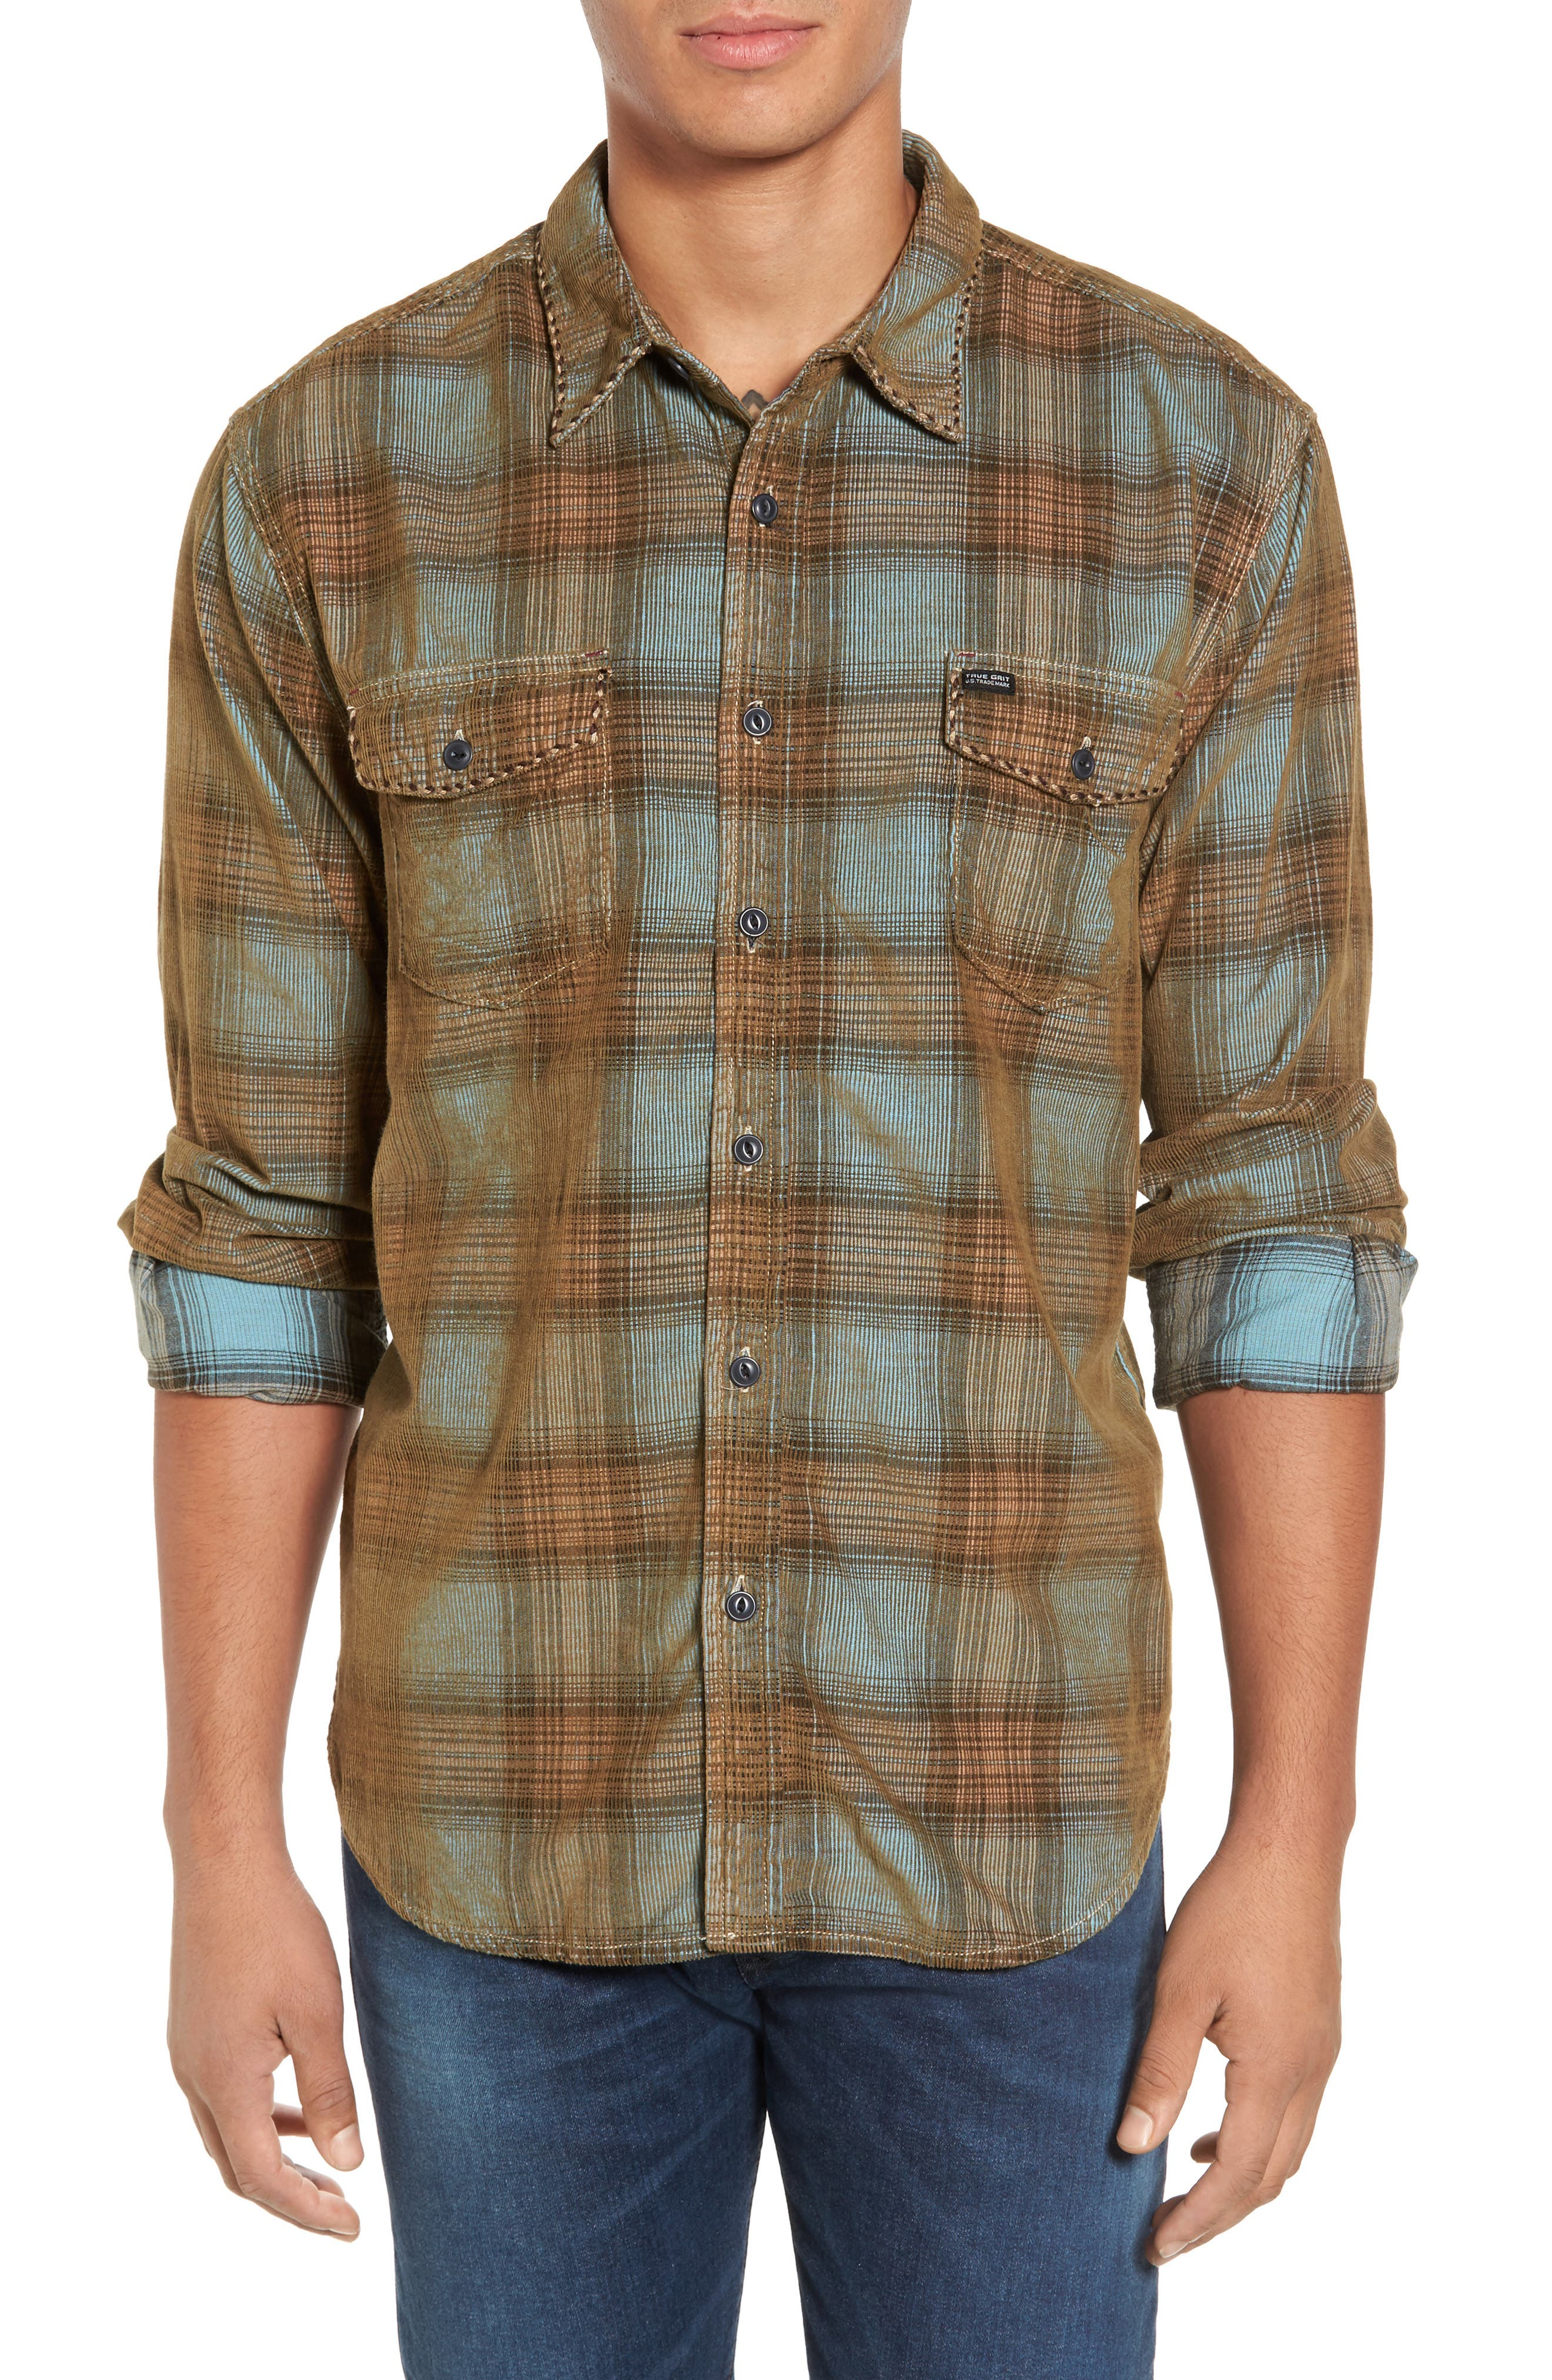 Main Image - True Grit Ventura Vintage Slim Fit Plaid Corduroy Shirt